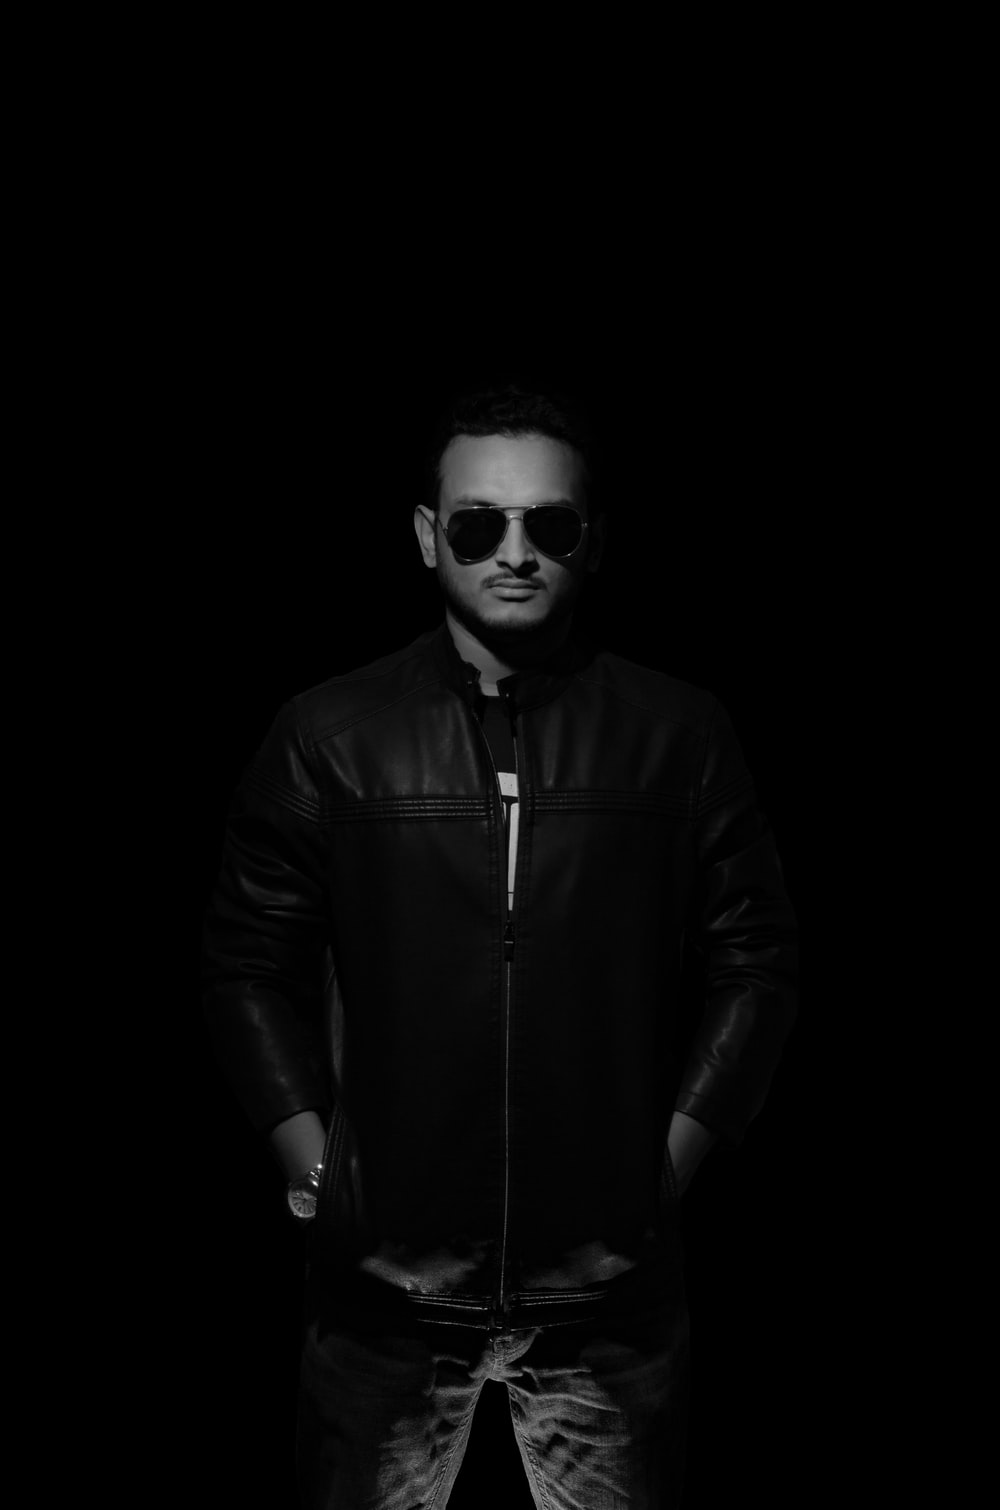 man in black leather zip up jacket wearing sunglasses